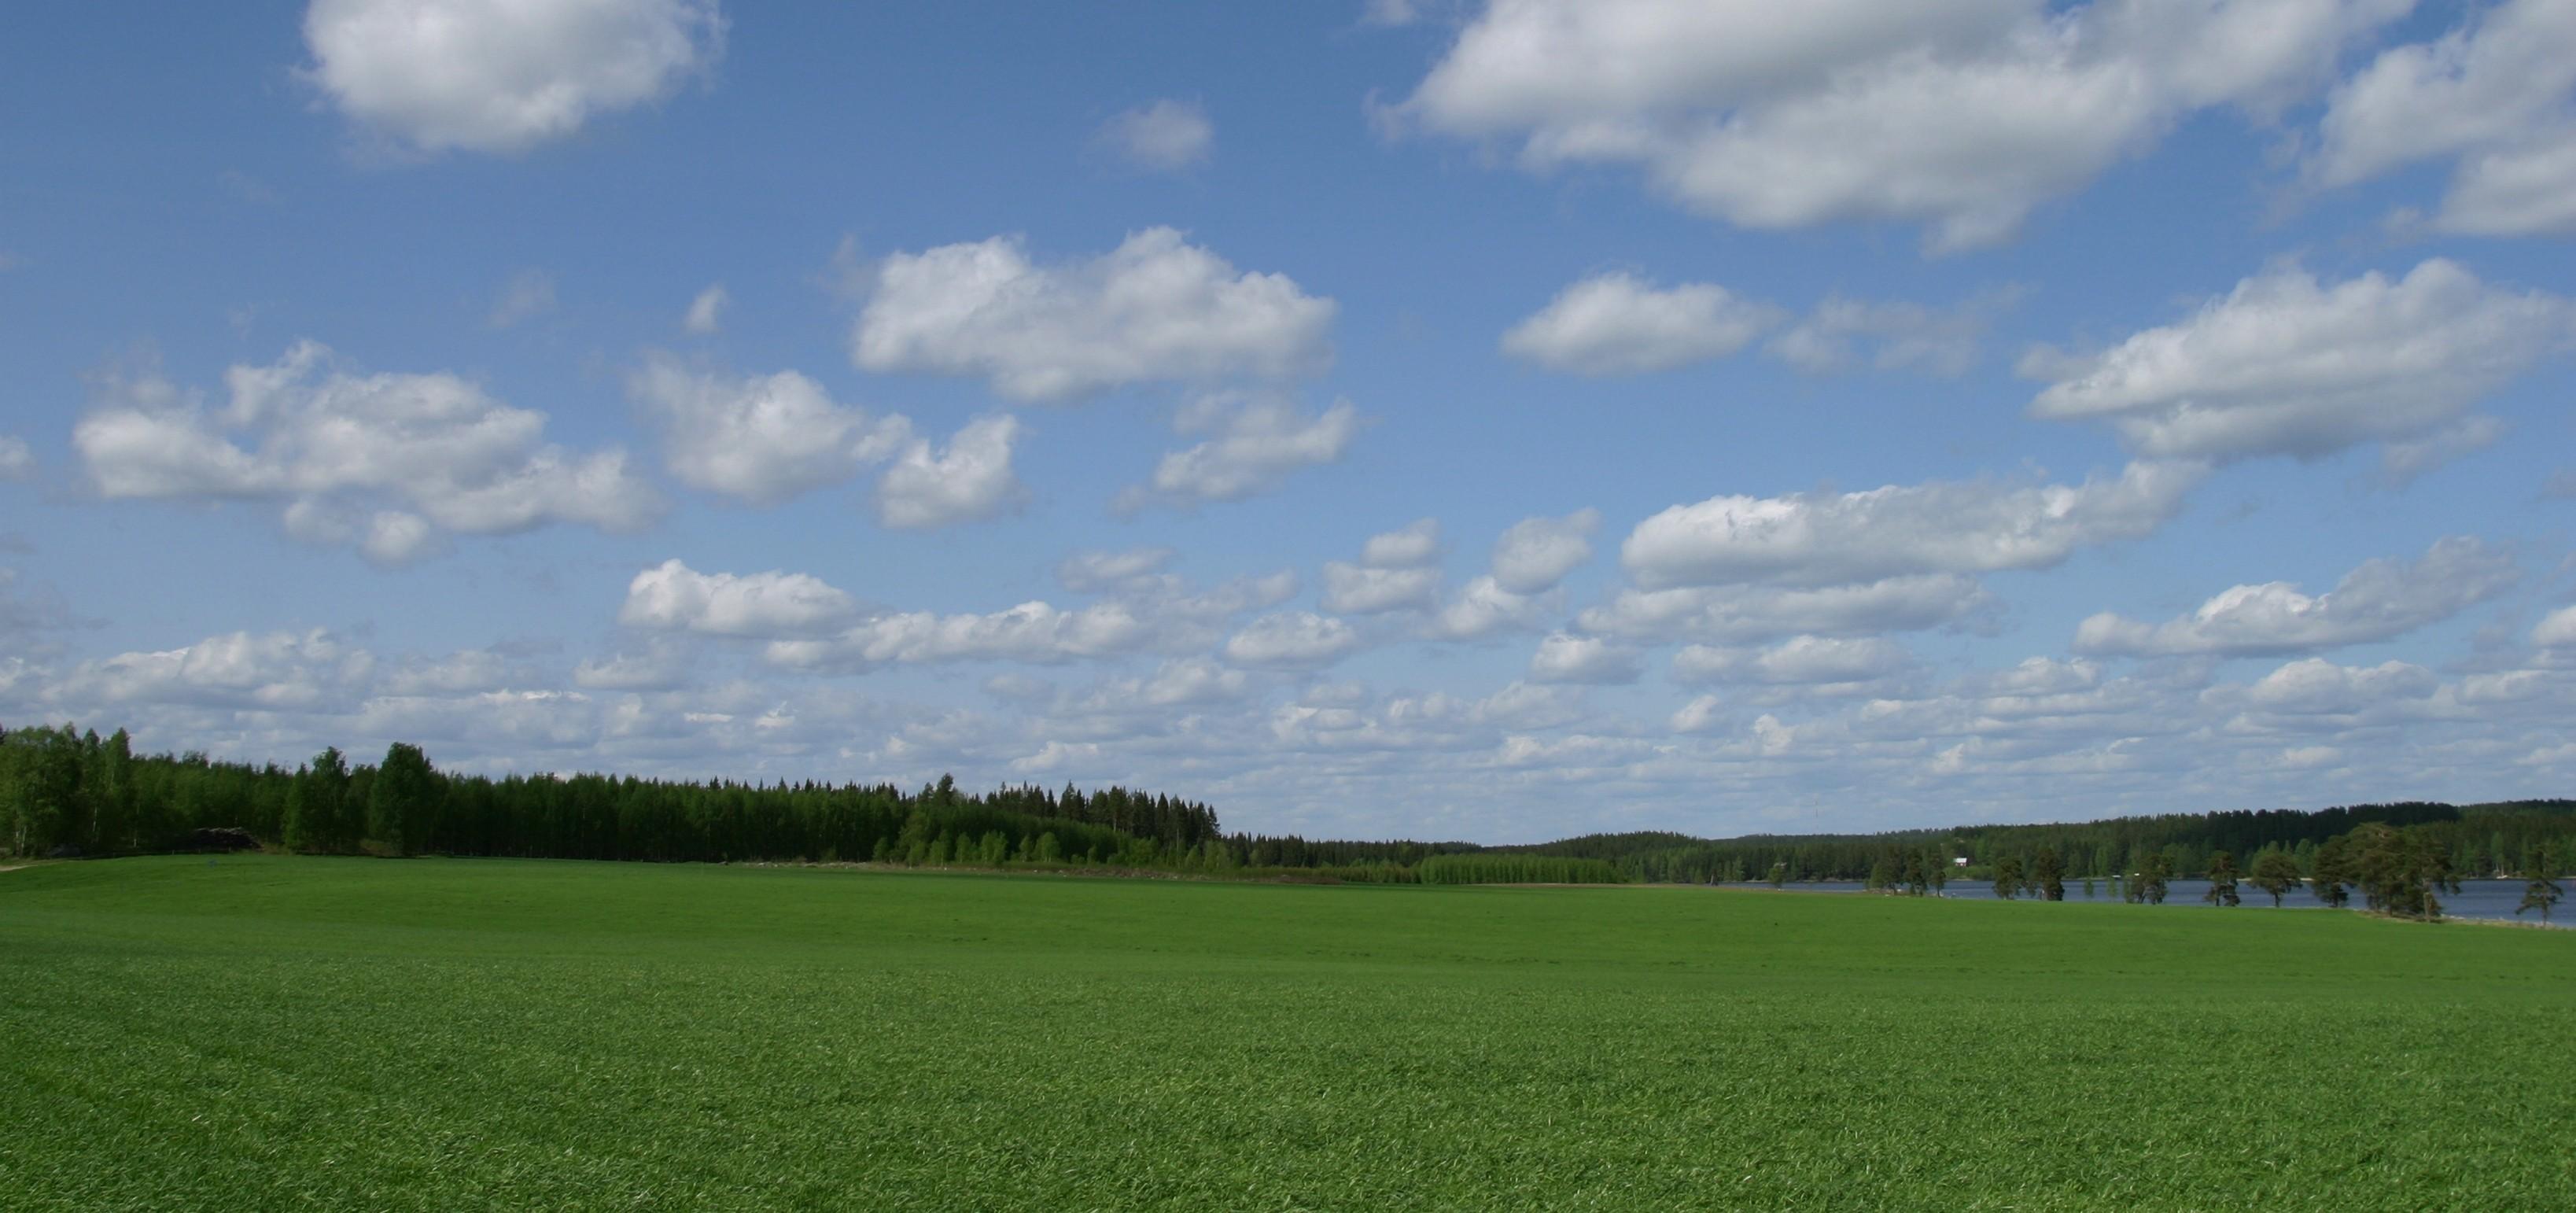 Green spring crop